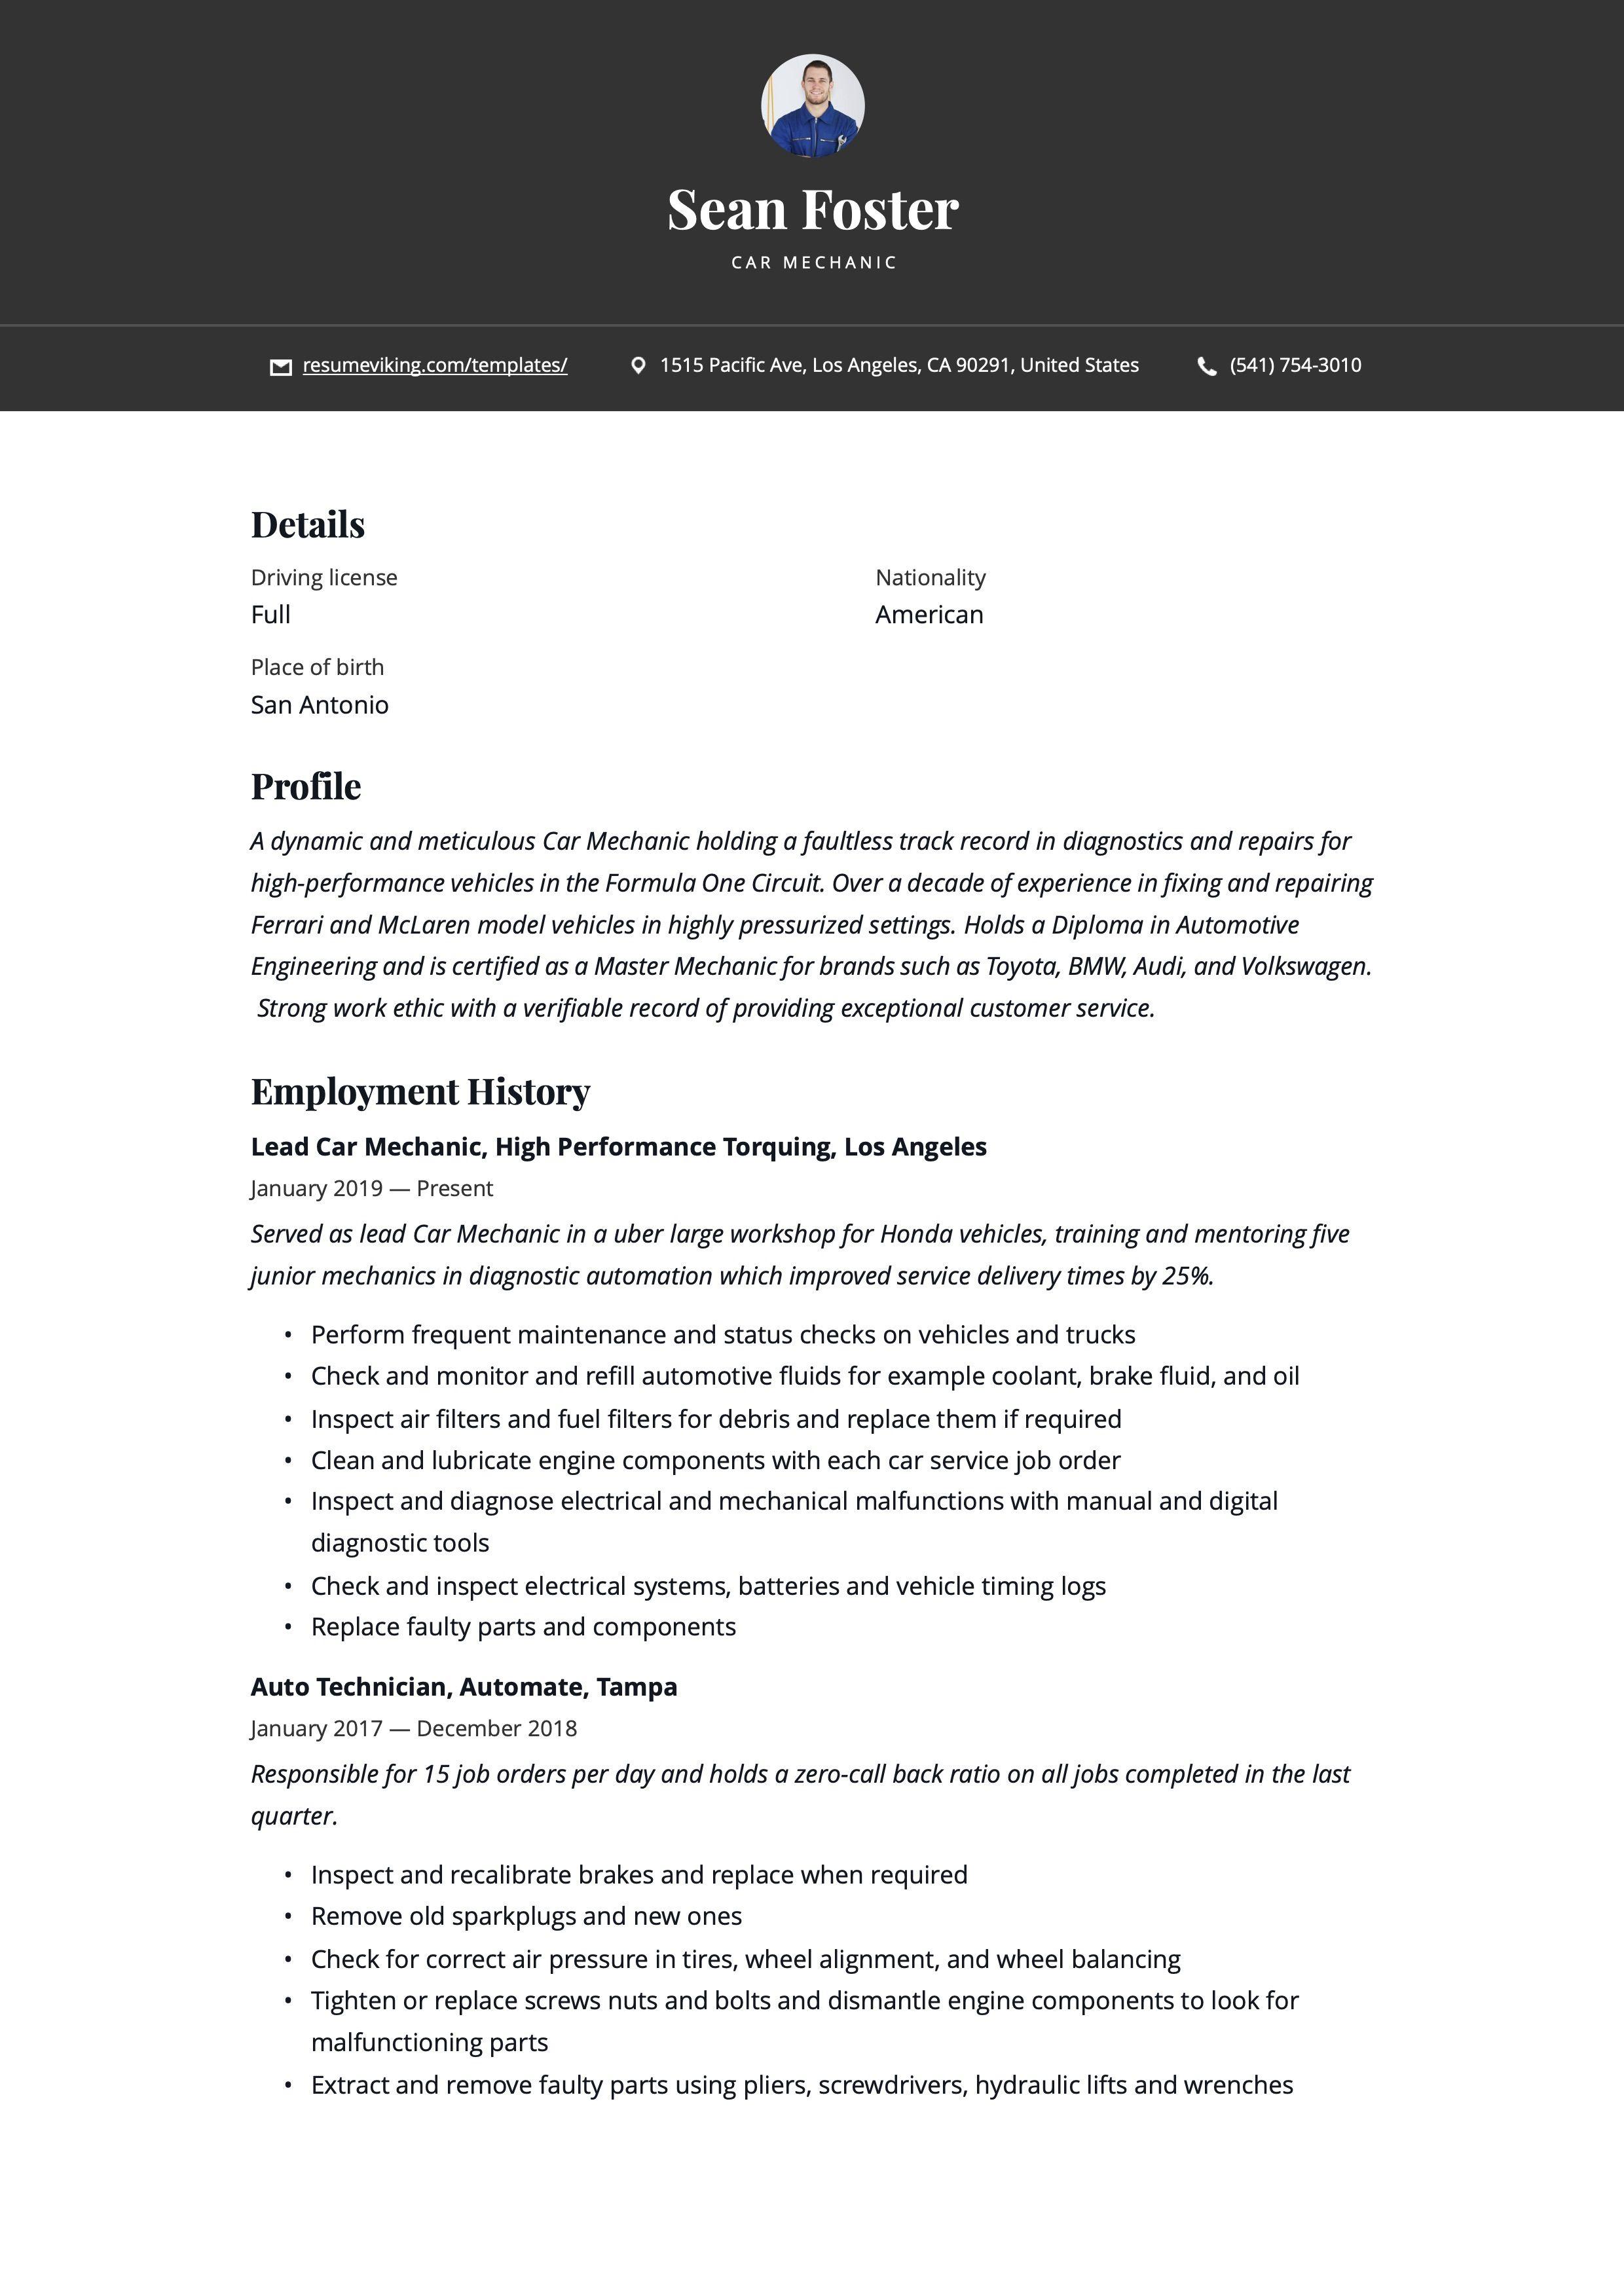 Car mechanic resume template in 2020 resume guide